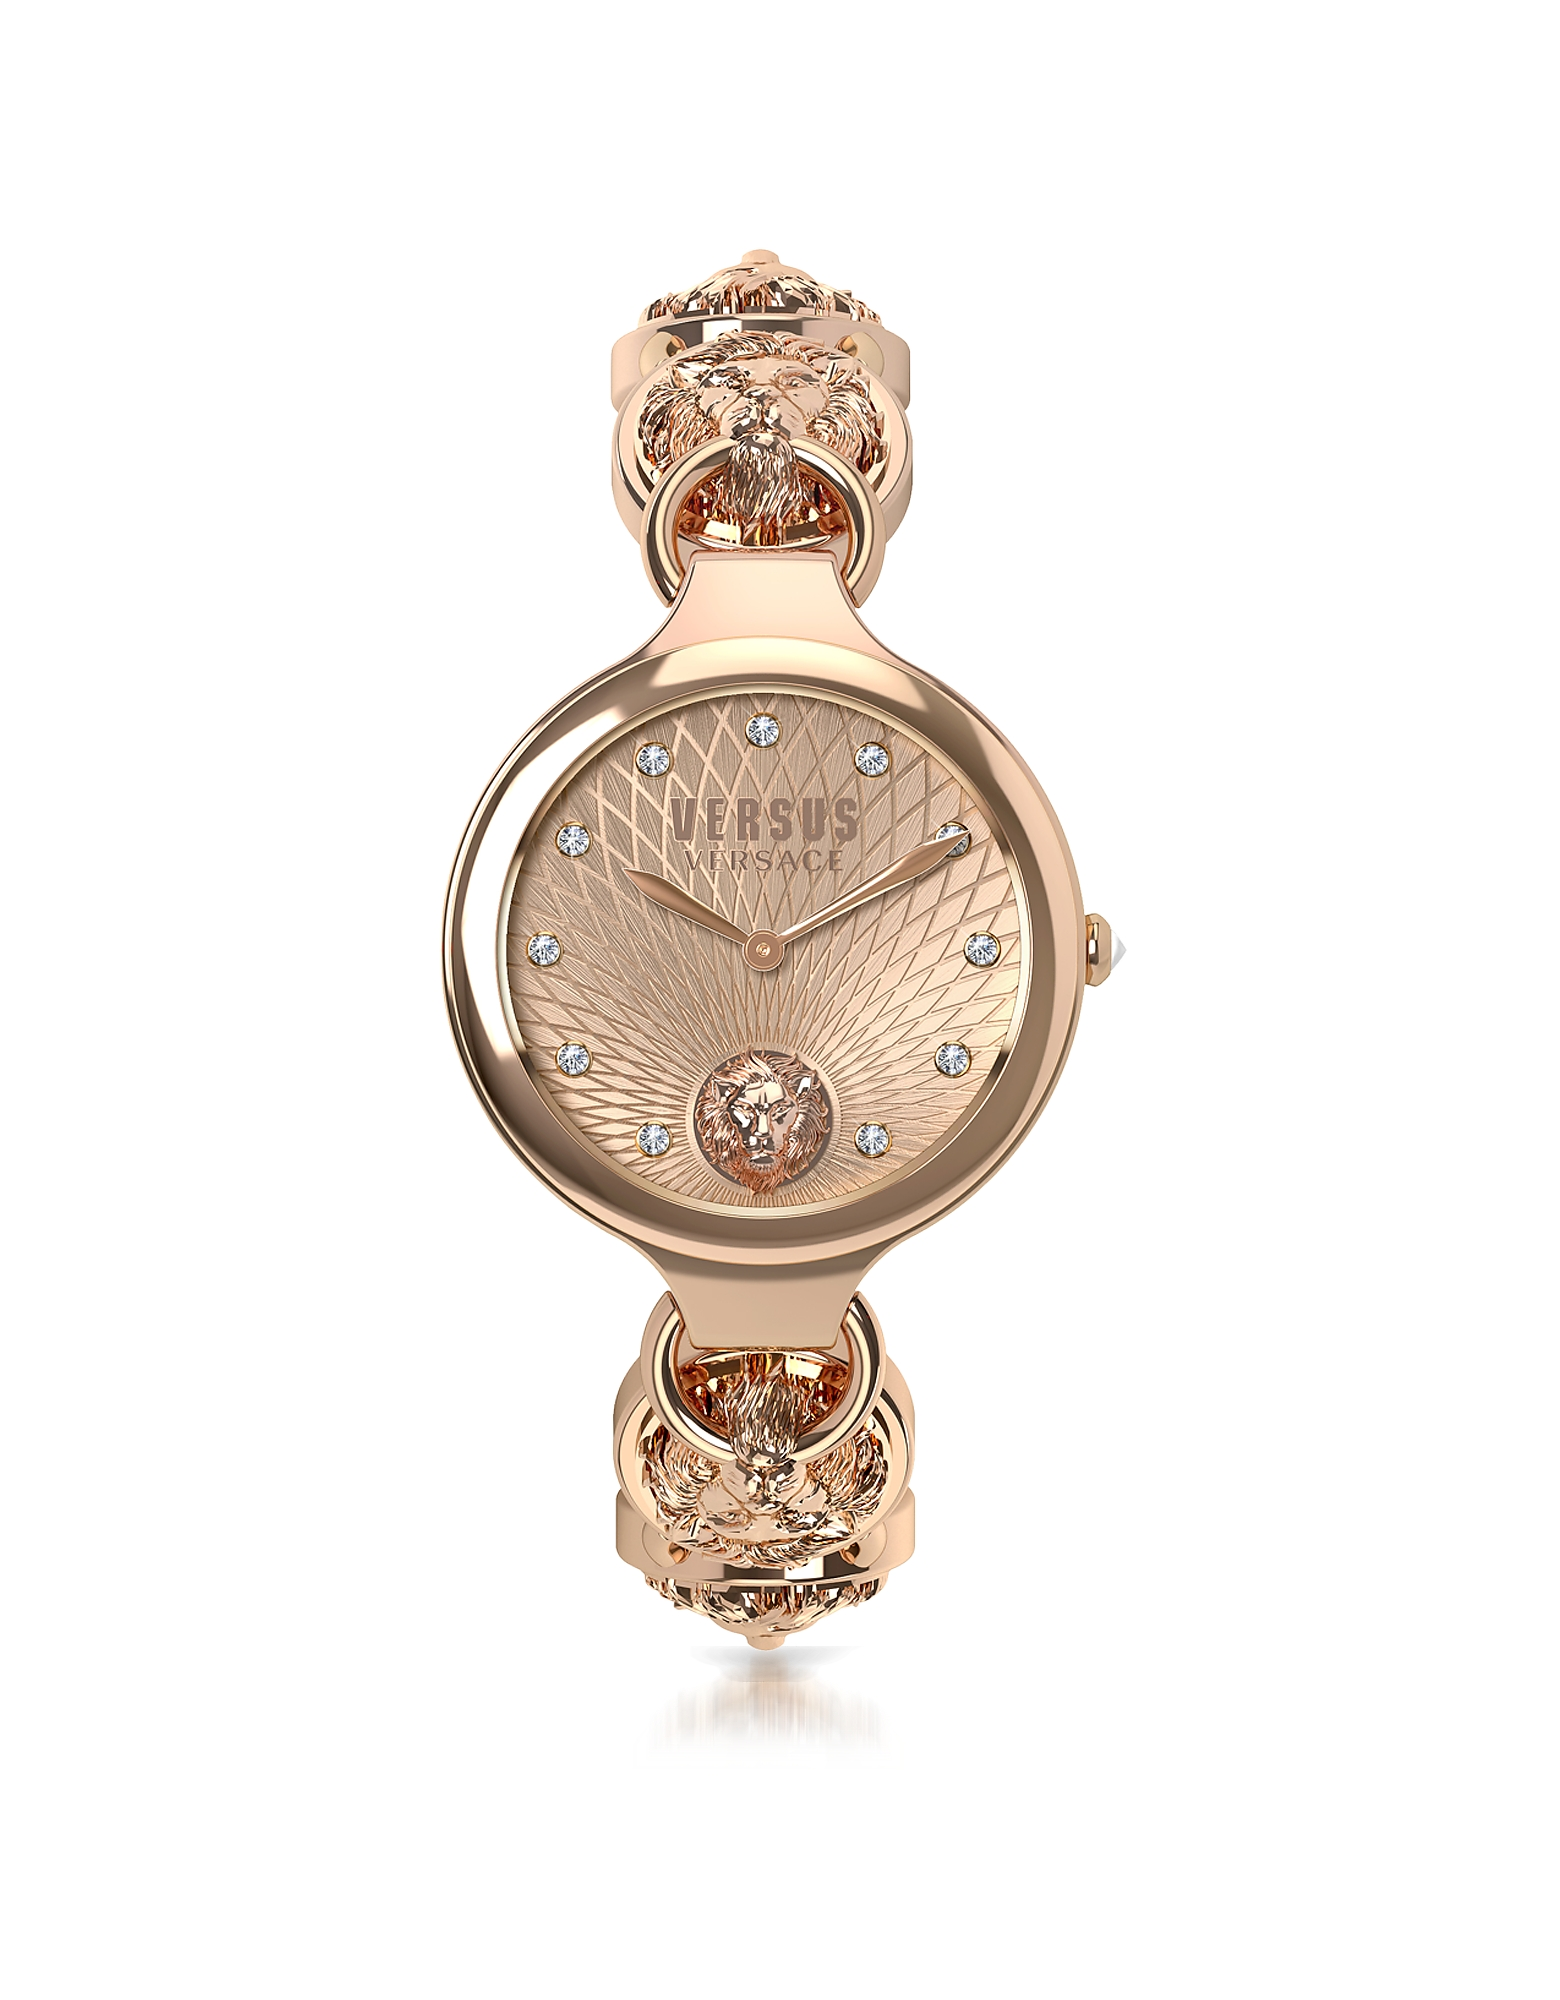 Broadwood Rose Gold Tone Stainless Steel Women's Bracelet Watch w/Crystals